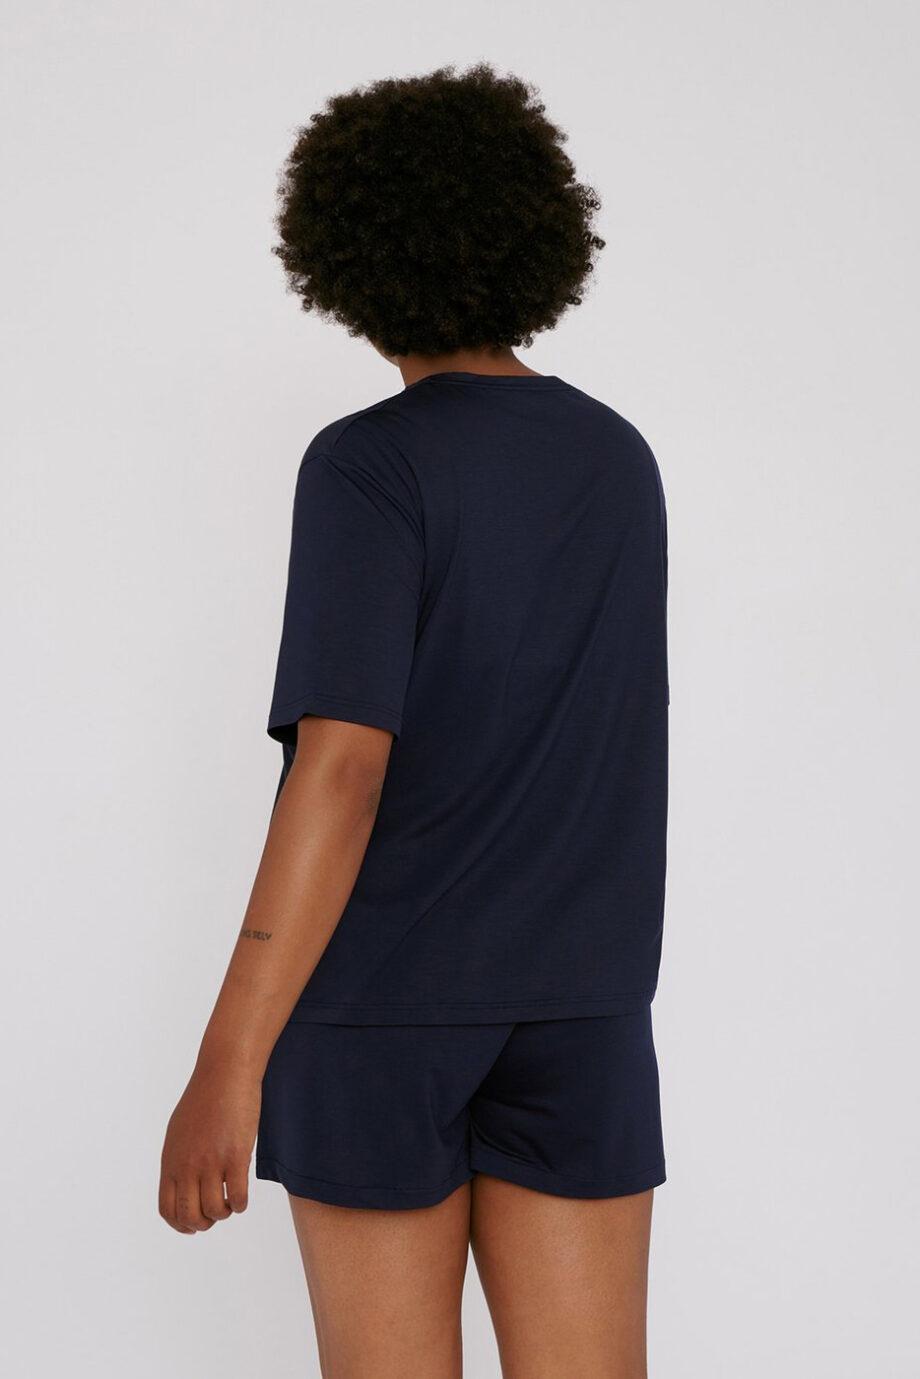 Organic Basics - shorts – navy_back